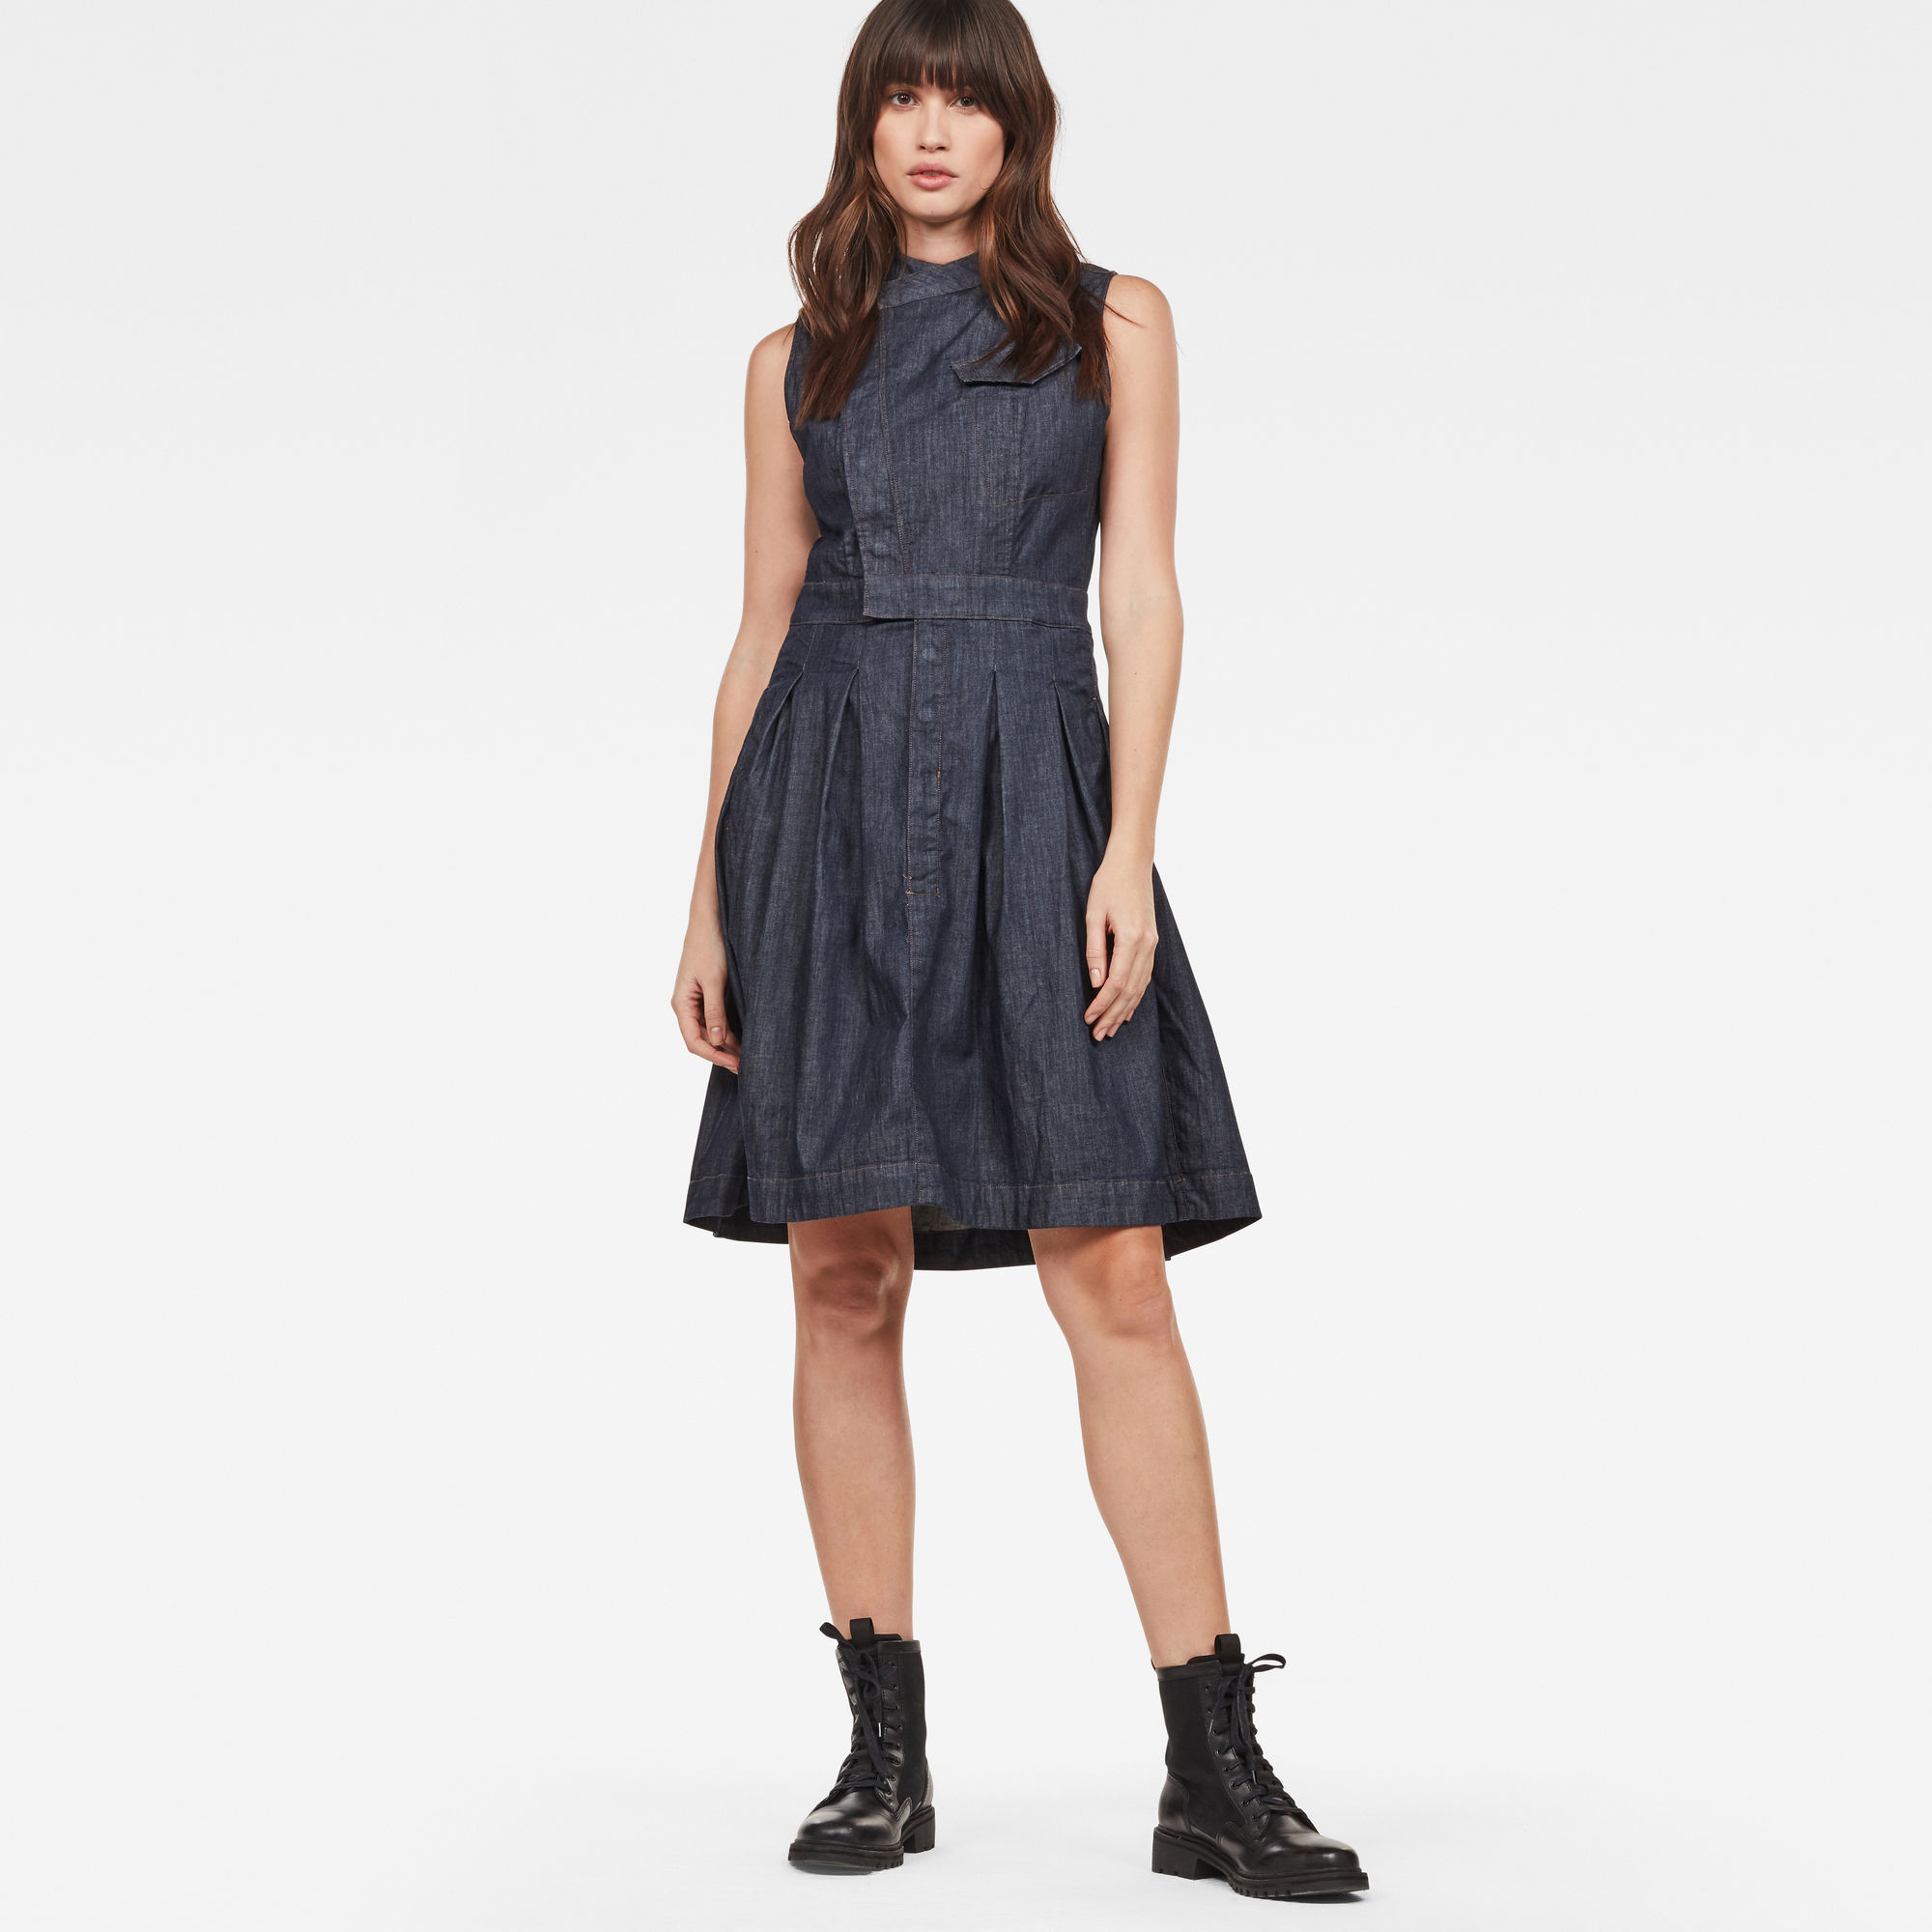 Hybrid Archive Pleated Sleeveless Shirt Dress